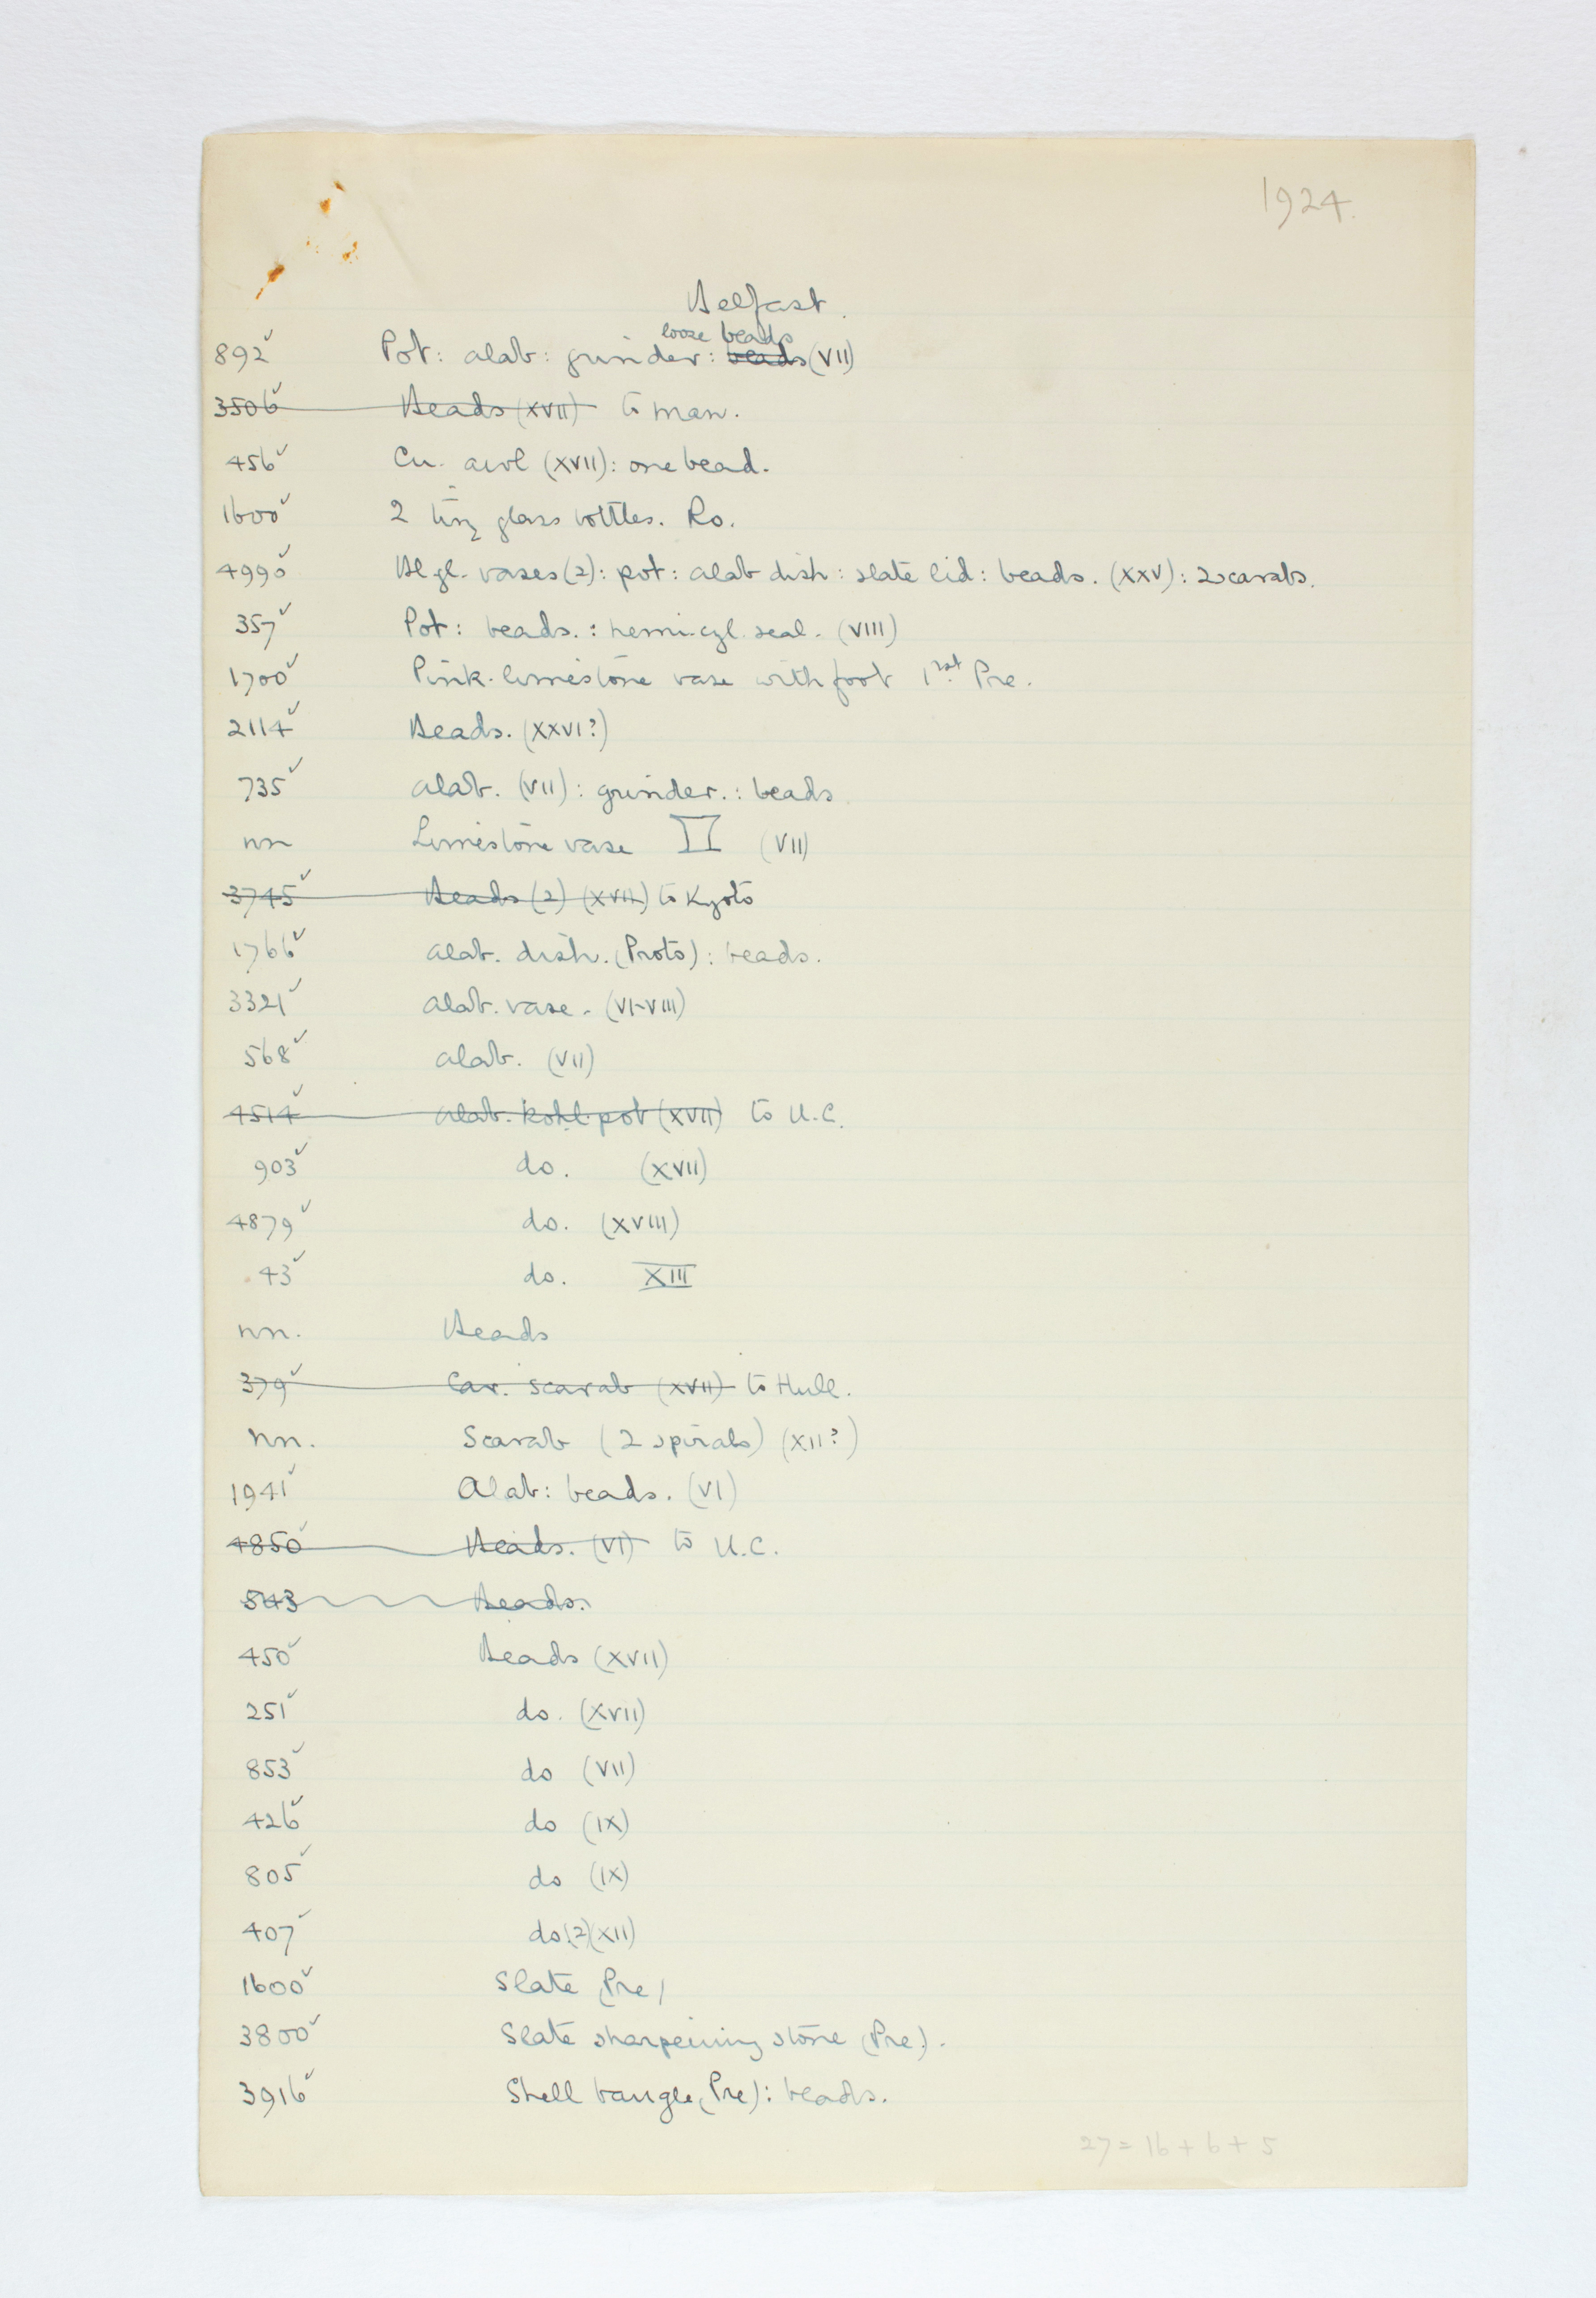 1923-24 Qau el-Kebir, Hemamieh Individual institution list PMA/WFP1/D/27/3.1